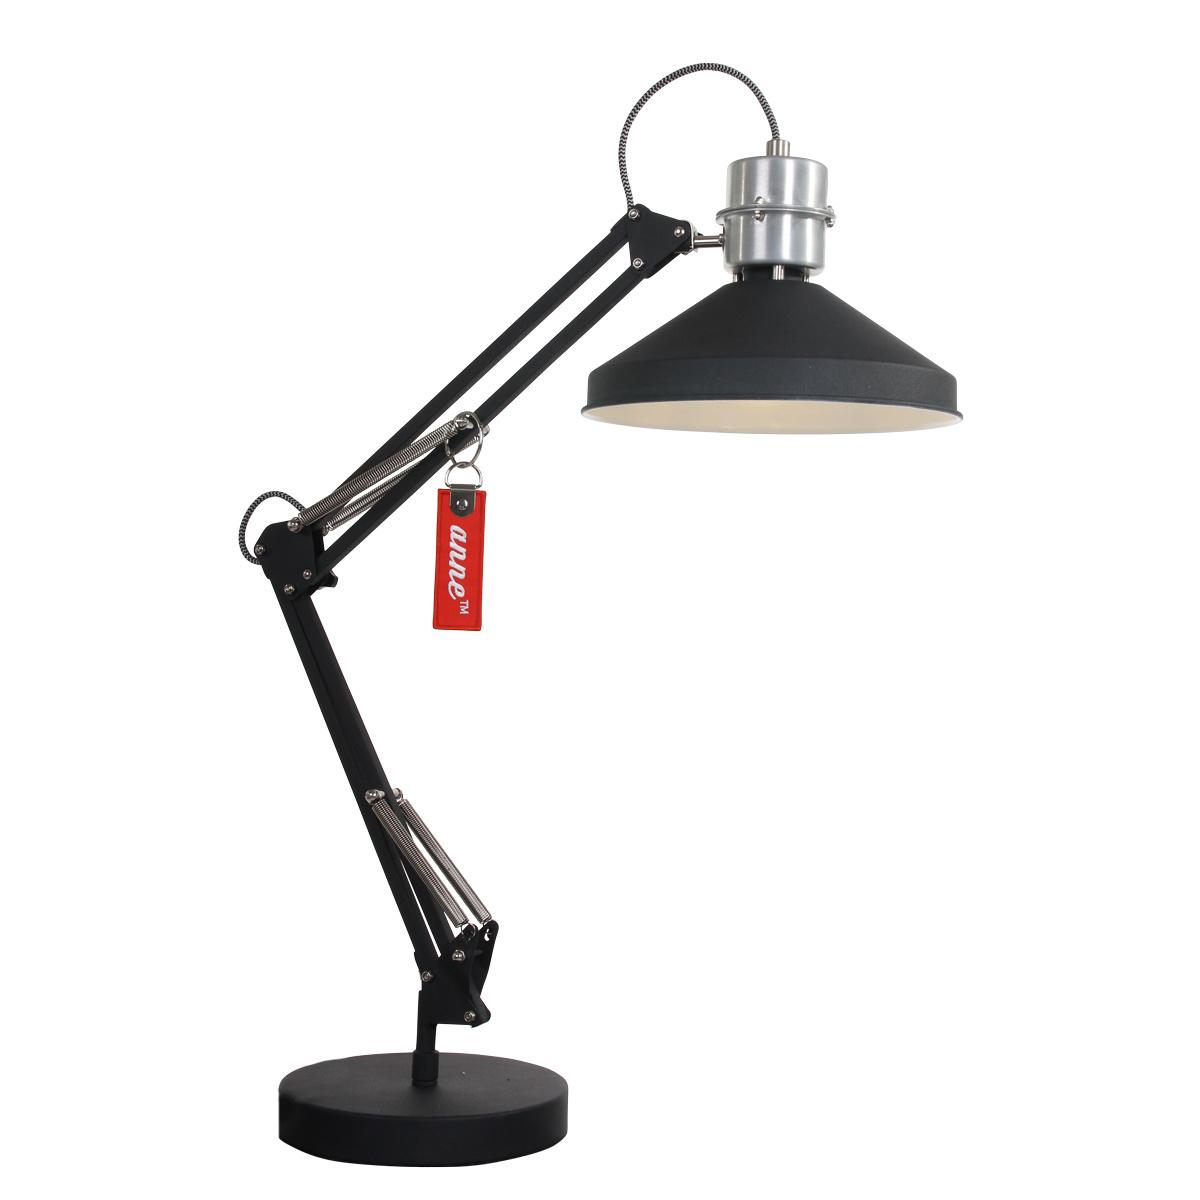 Anne Light & home Tafellamp Zappa 7702zw